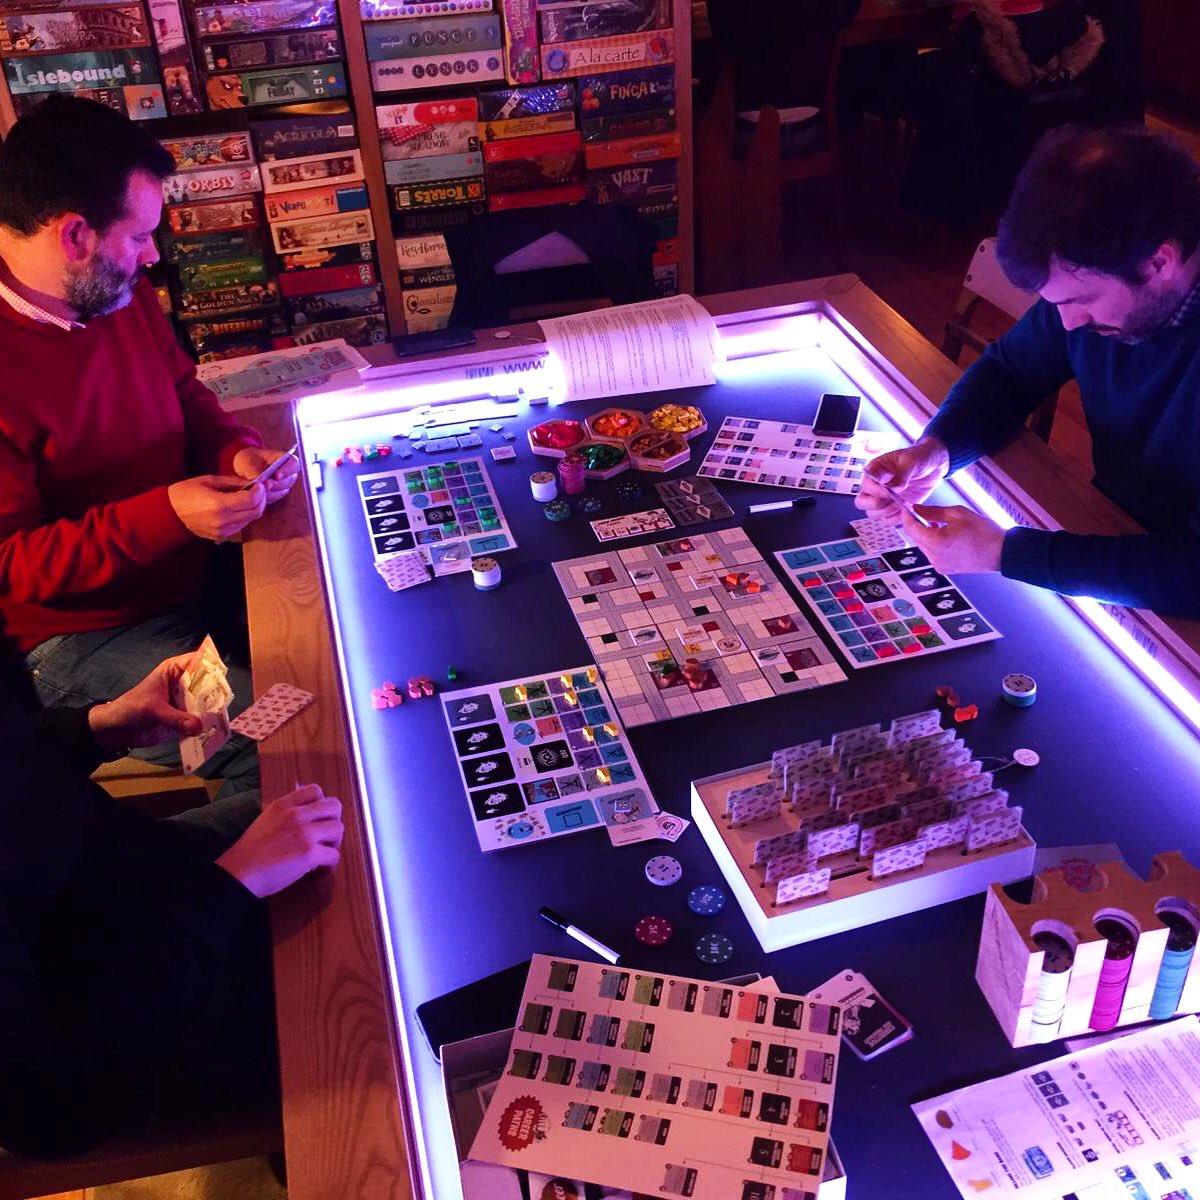 "Are you a board game geek? Come to ""Minha Madeira & A Jogar"" board game lounge in Matosinhos. Mercado Metro Station #ajogarequeagenteseentende #geek #spiel #juegosdemesa #jeuxdesociete #jogosdetabuleiro #boardgamegeek #boardgame #bgg #tabletop #boardgaming #brettspiel #foodchainpic.twitter.com/t5WgmMYu40"